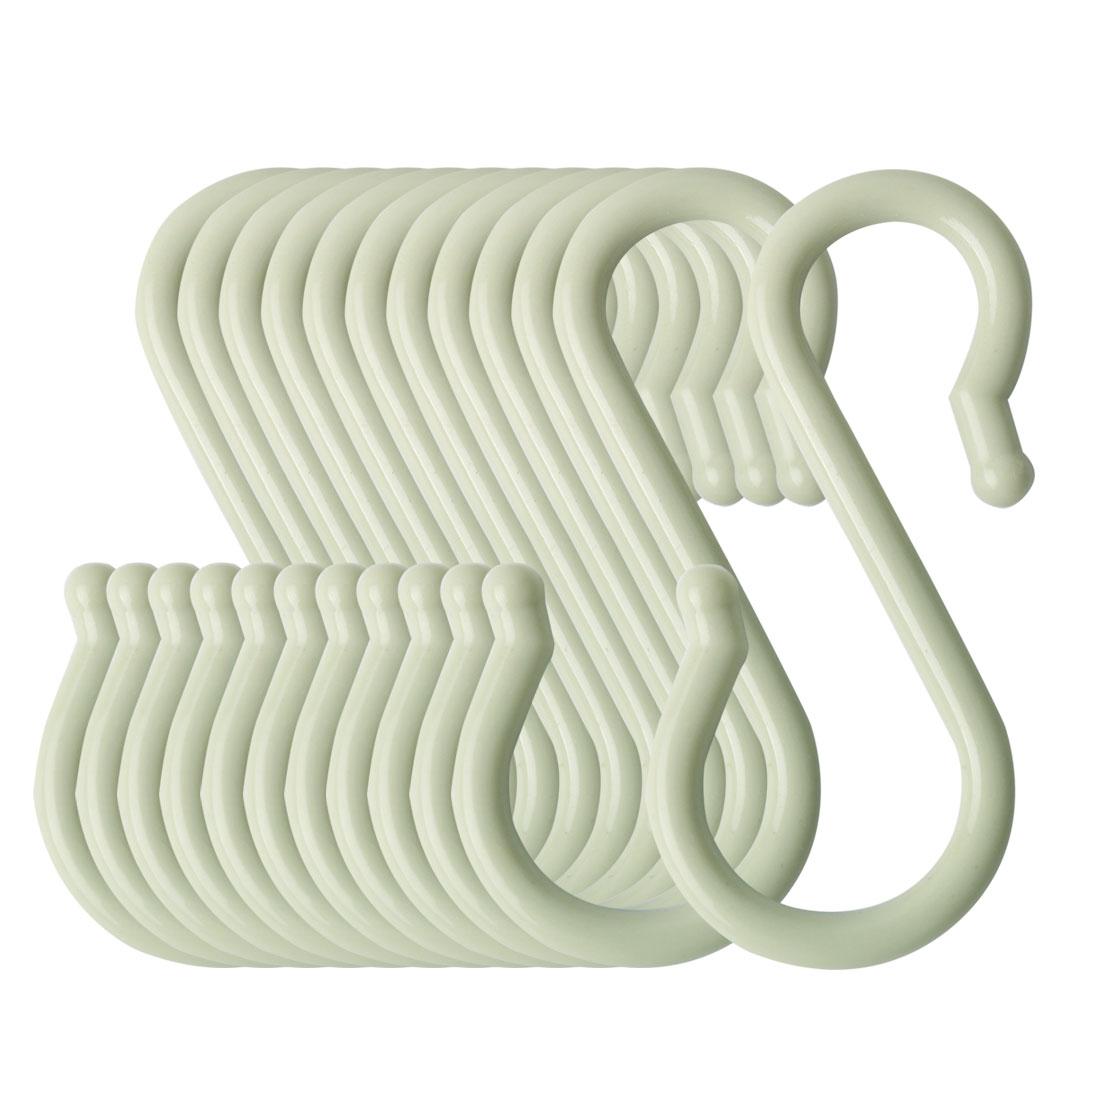 12 Pack S Hook Plastic for Kitchen Pots Utensils Coat Towel Hanging Light Green